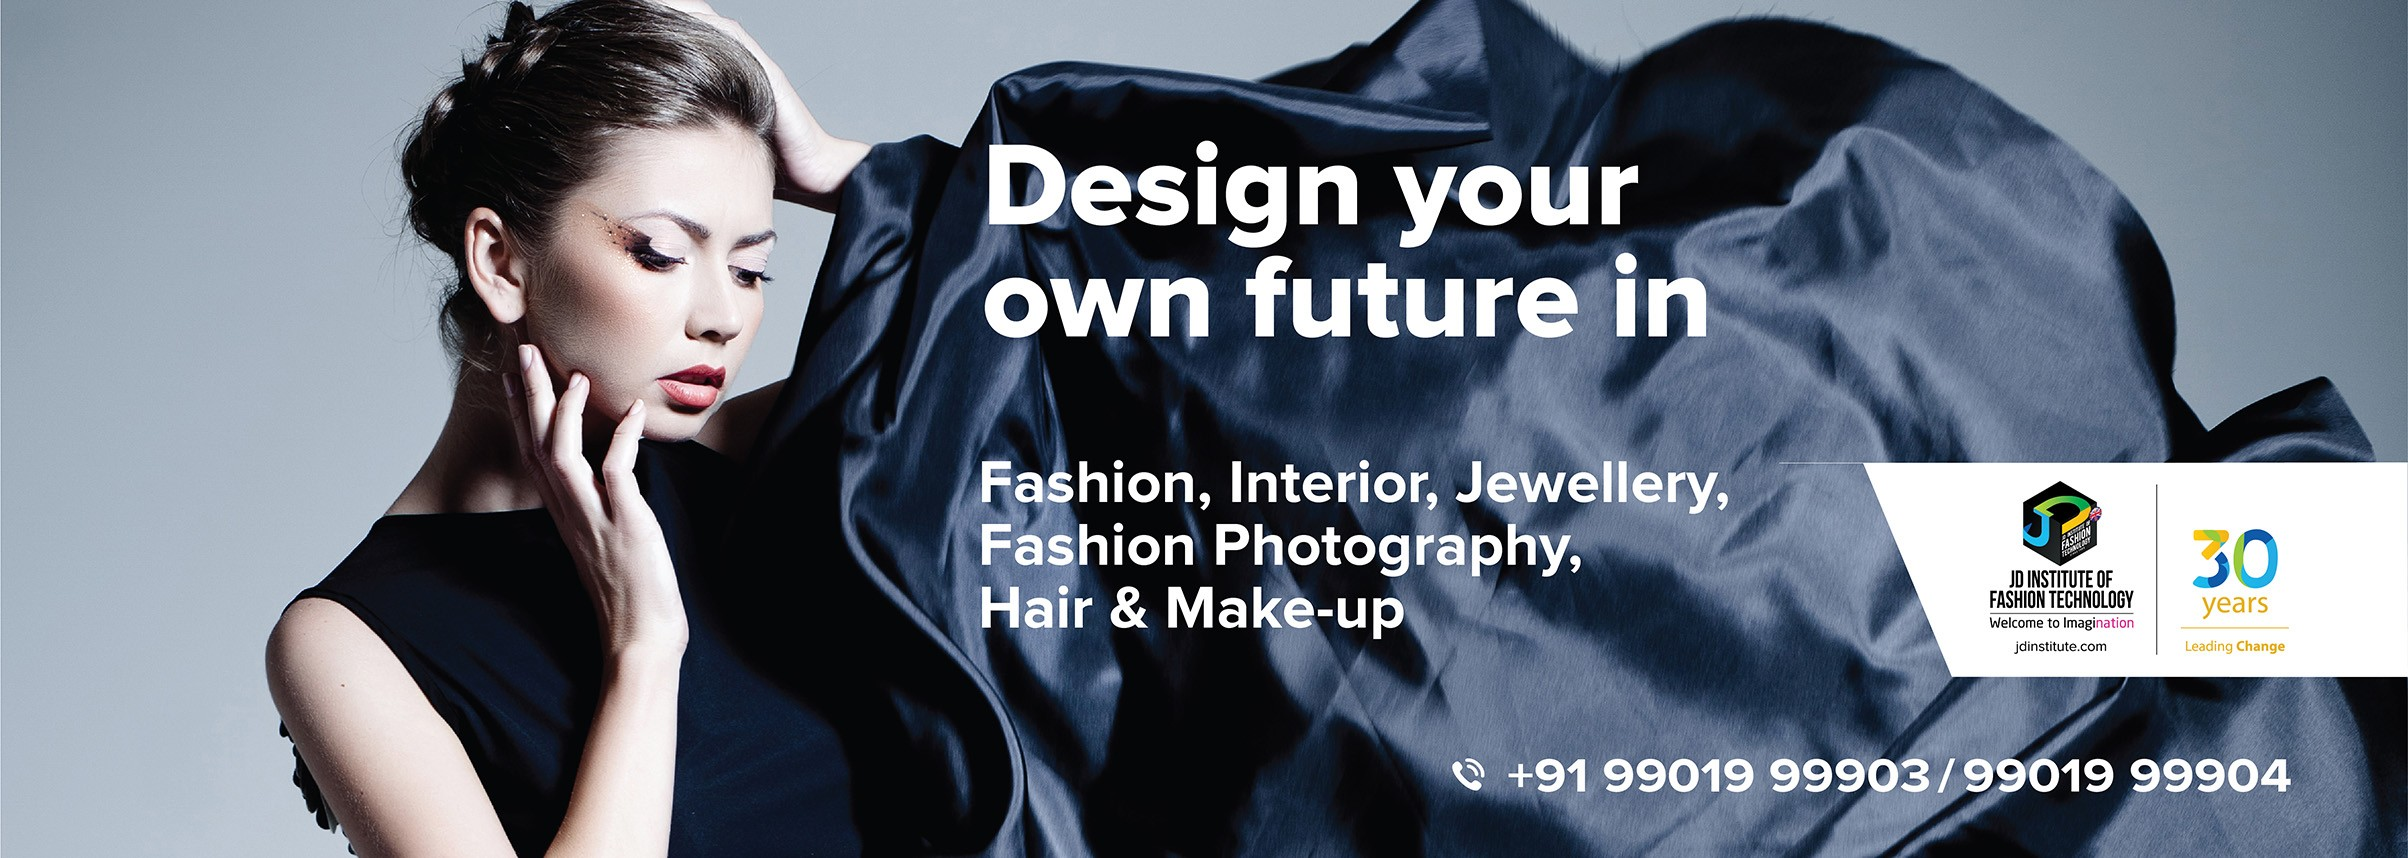 Jd Institute Of Fashion Technology Linkedin